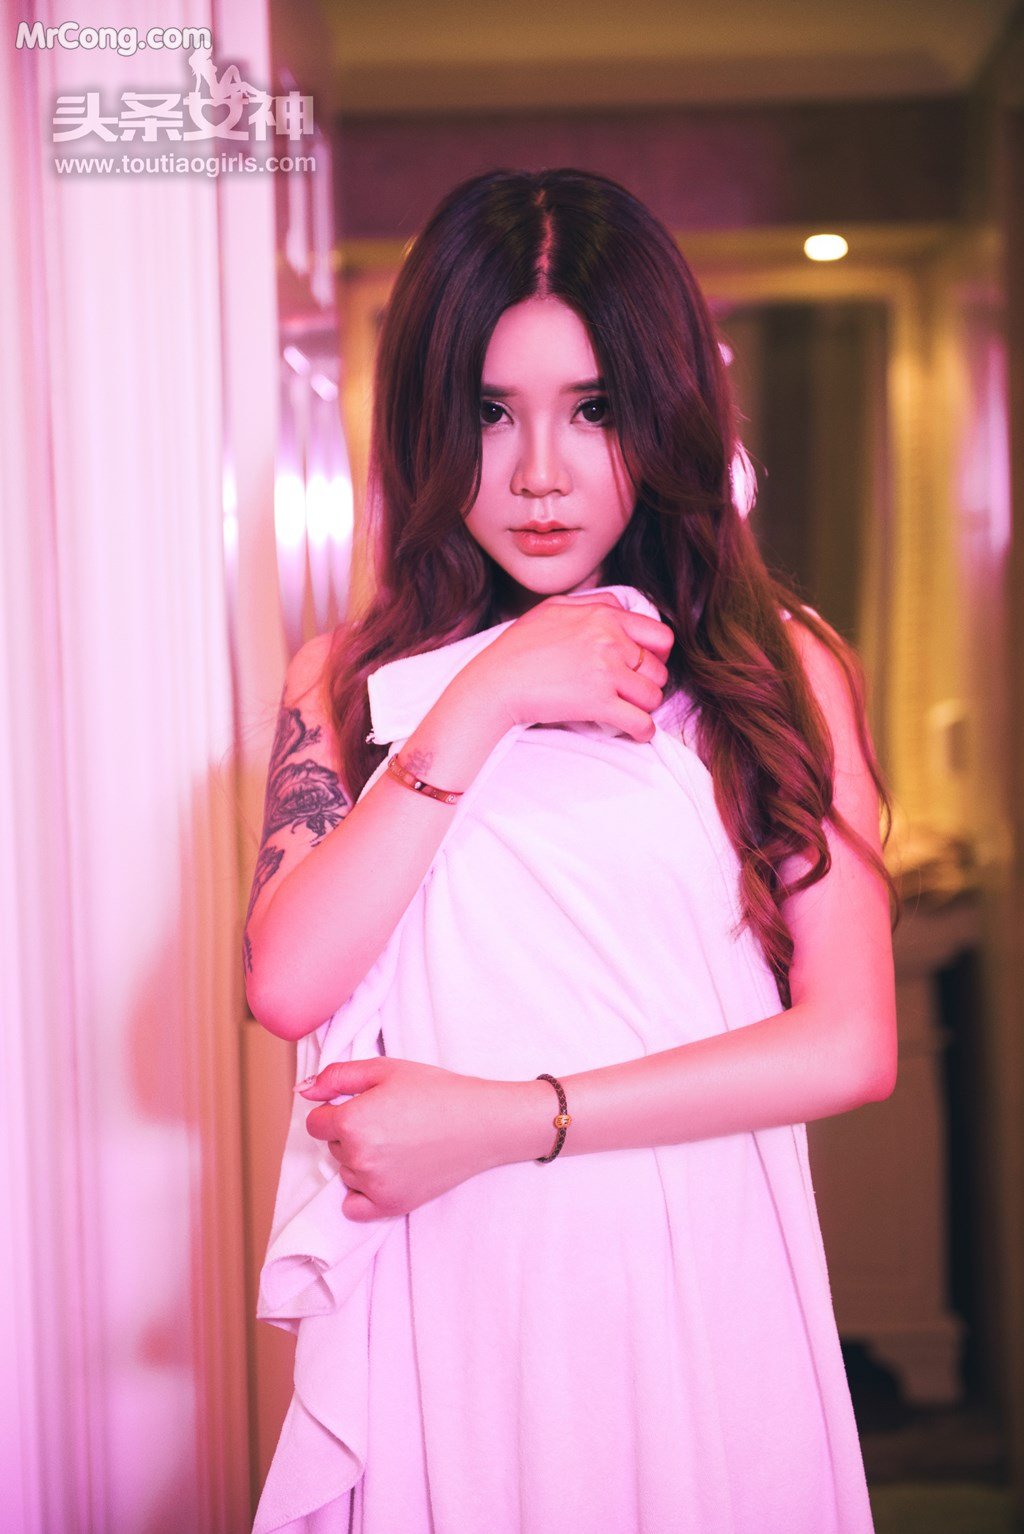 Image TouTiao-2017-08-18-Lisa-Aili-Sha--Jiu-Er-MrCong.com-023 in post TouTiao 2017-08-18: Người mẫu Lisa (爱丽莎) và Jiu Er (九儿) (52 ảnh)